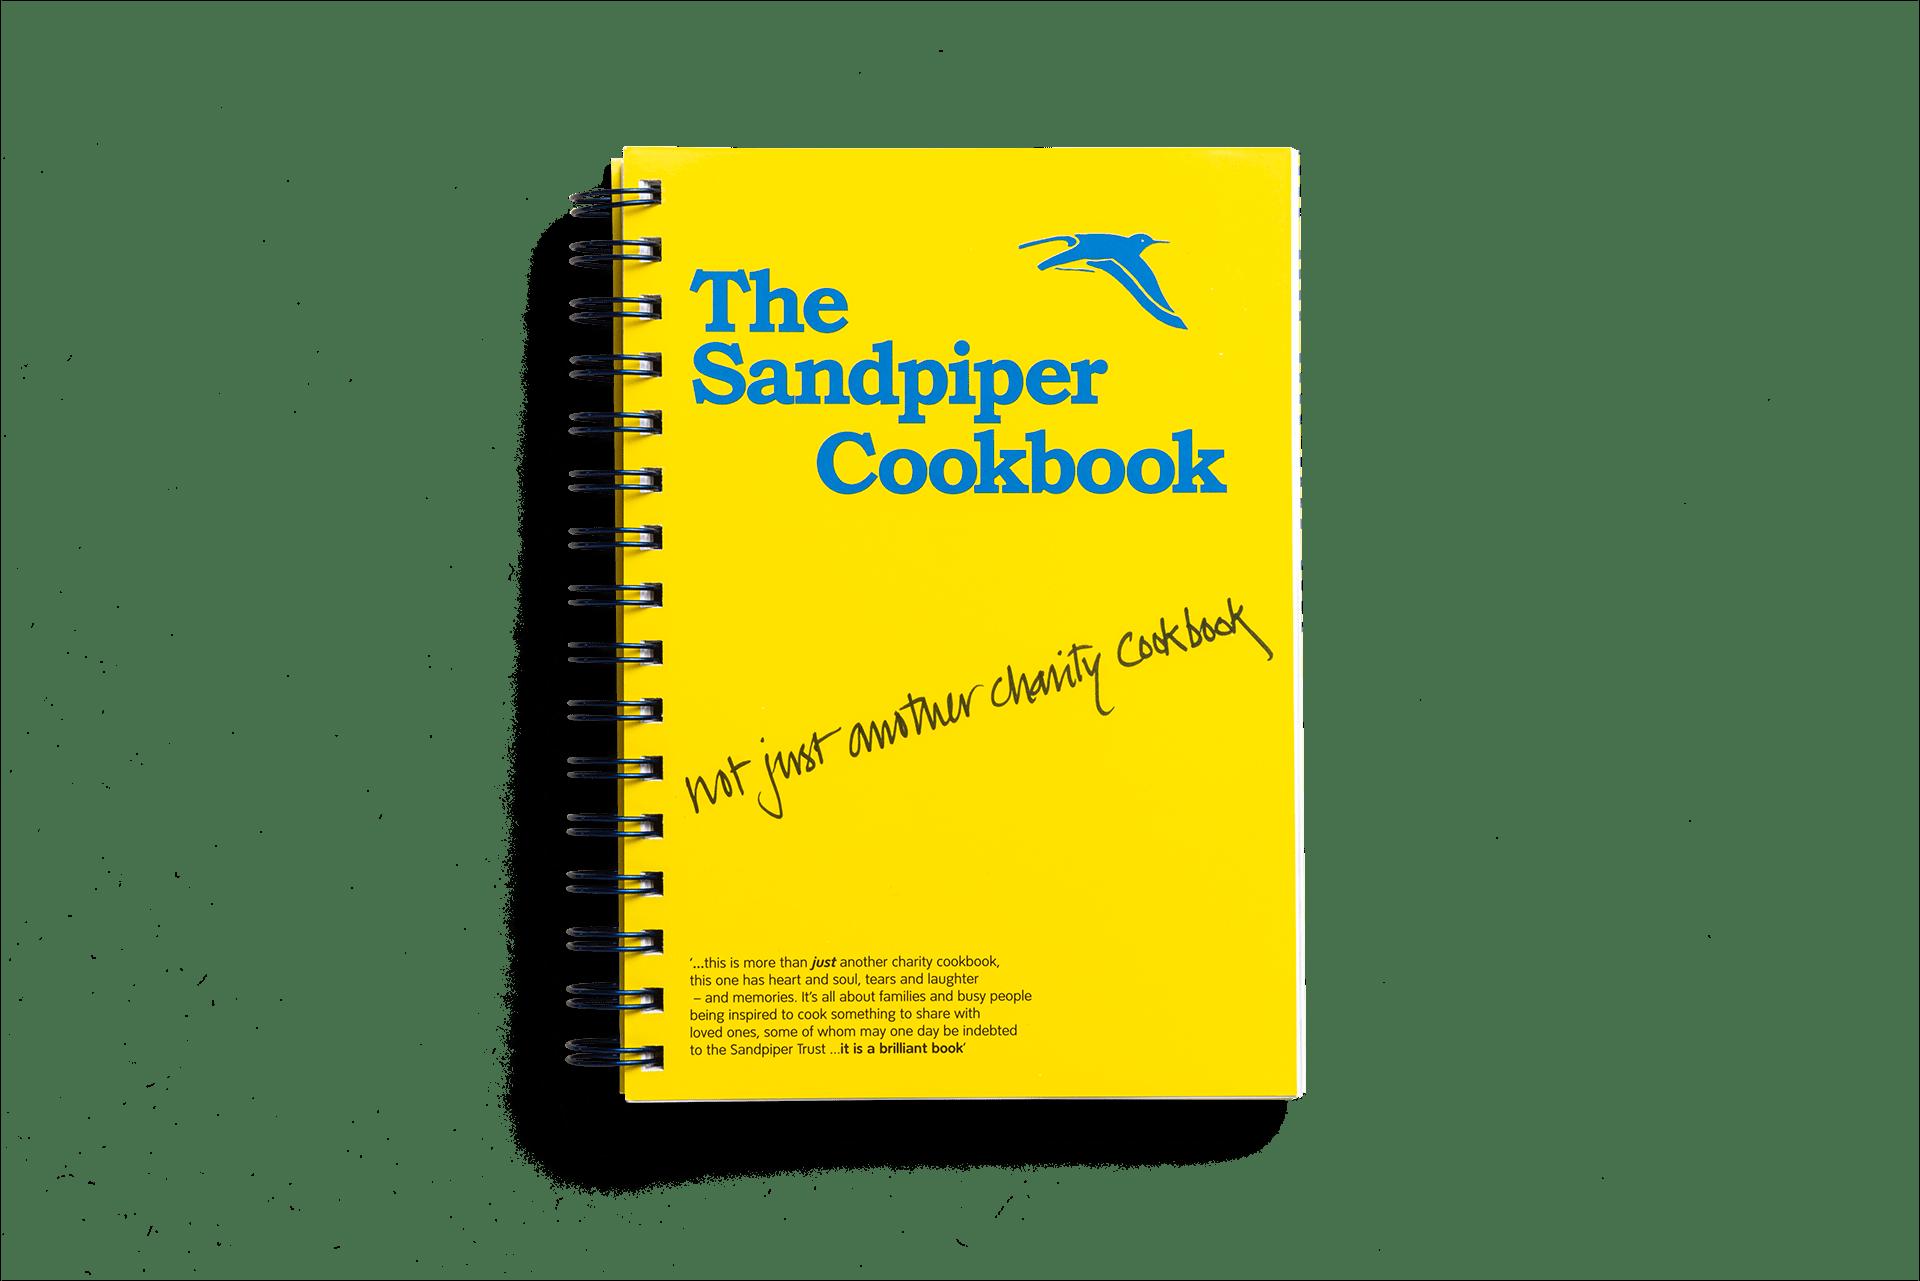 The Sandpiper Cookbook